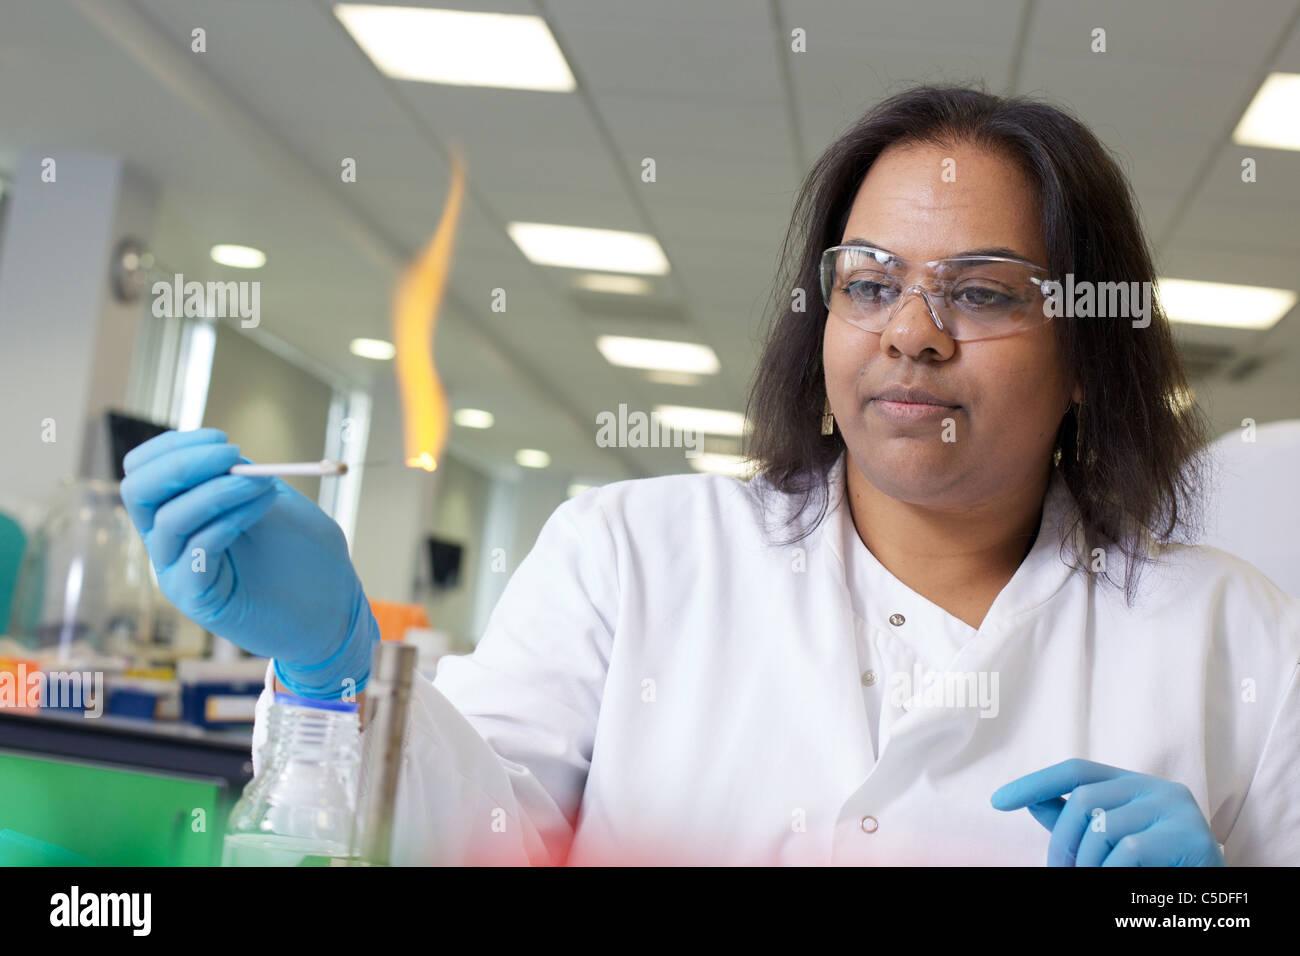 Labor-Techniker chemische Tests an der Leeds Metropolitan University.Bio Chemielabors. Stockbild